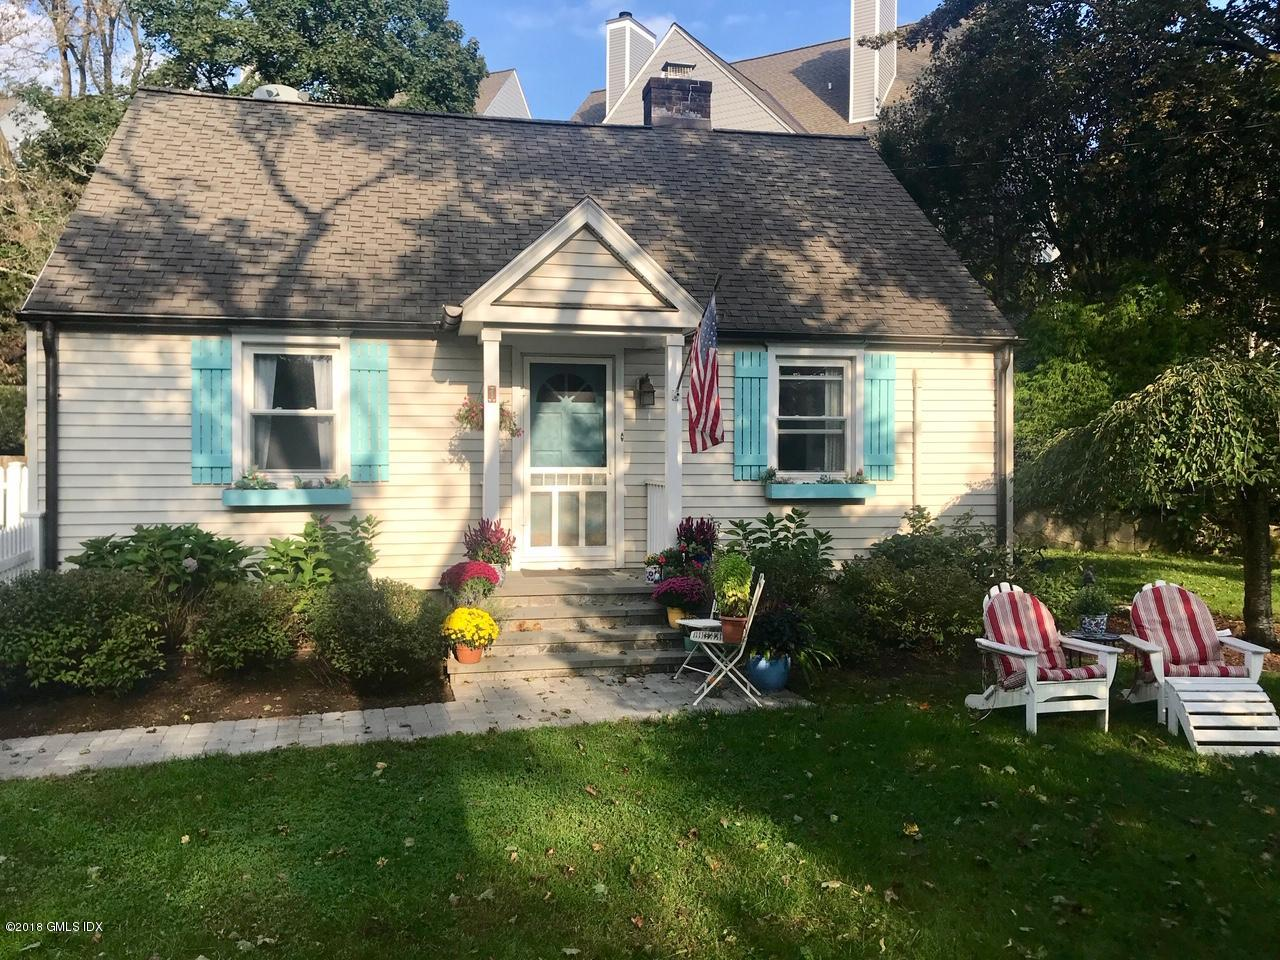 1 Idlewild Manor Greenwich,Connecticut 06830,3 Bedrooms Bedrooms,2 BathroomsBathrooms,Single family,Idlewild Manor,108040